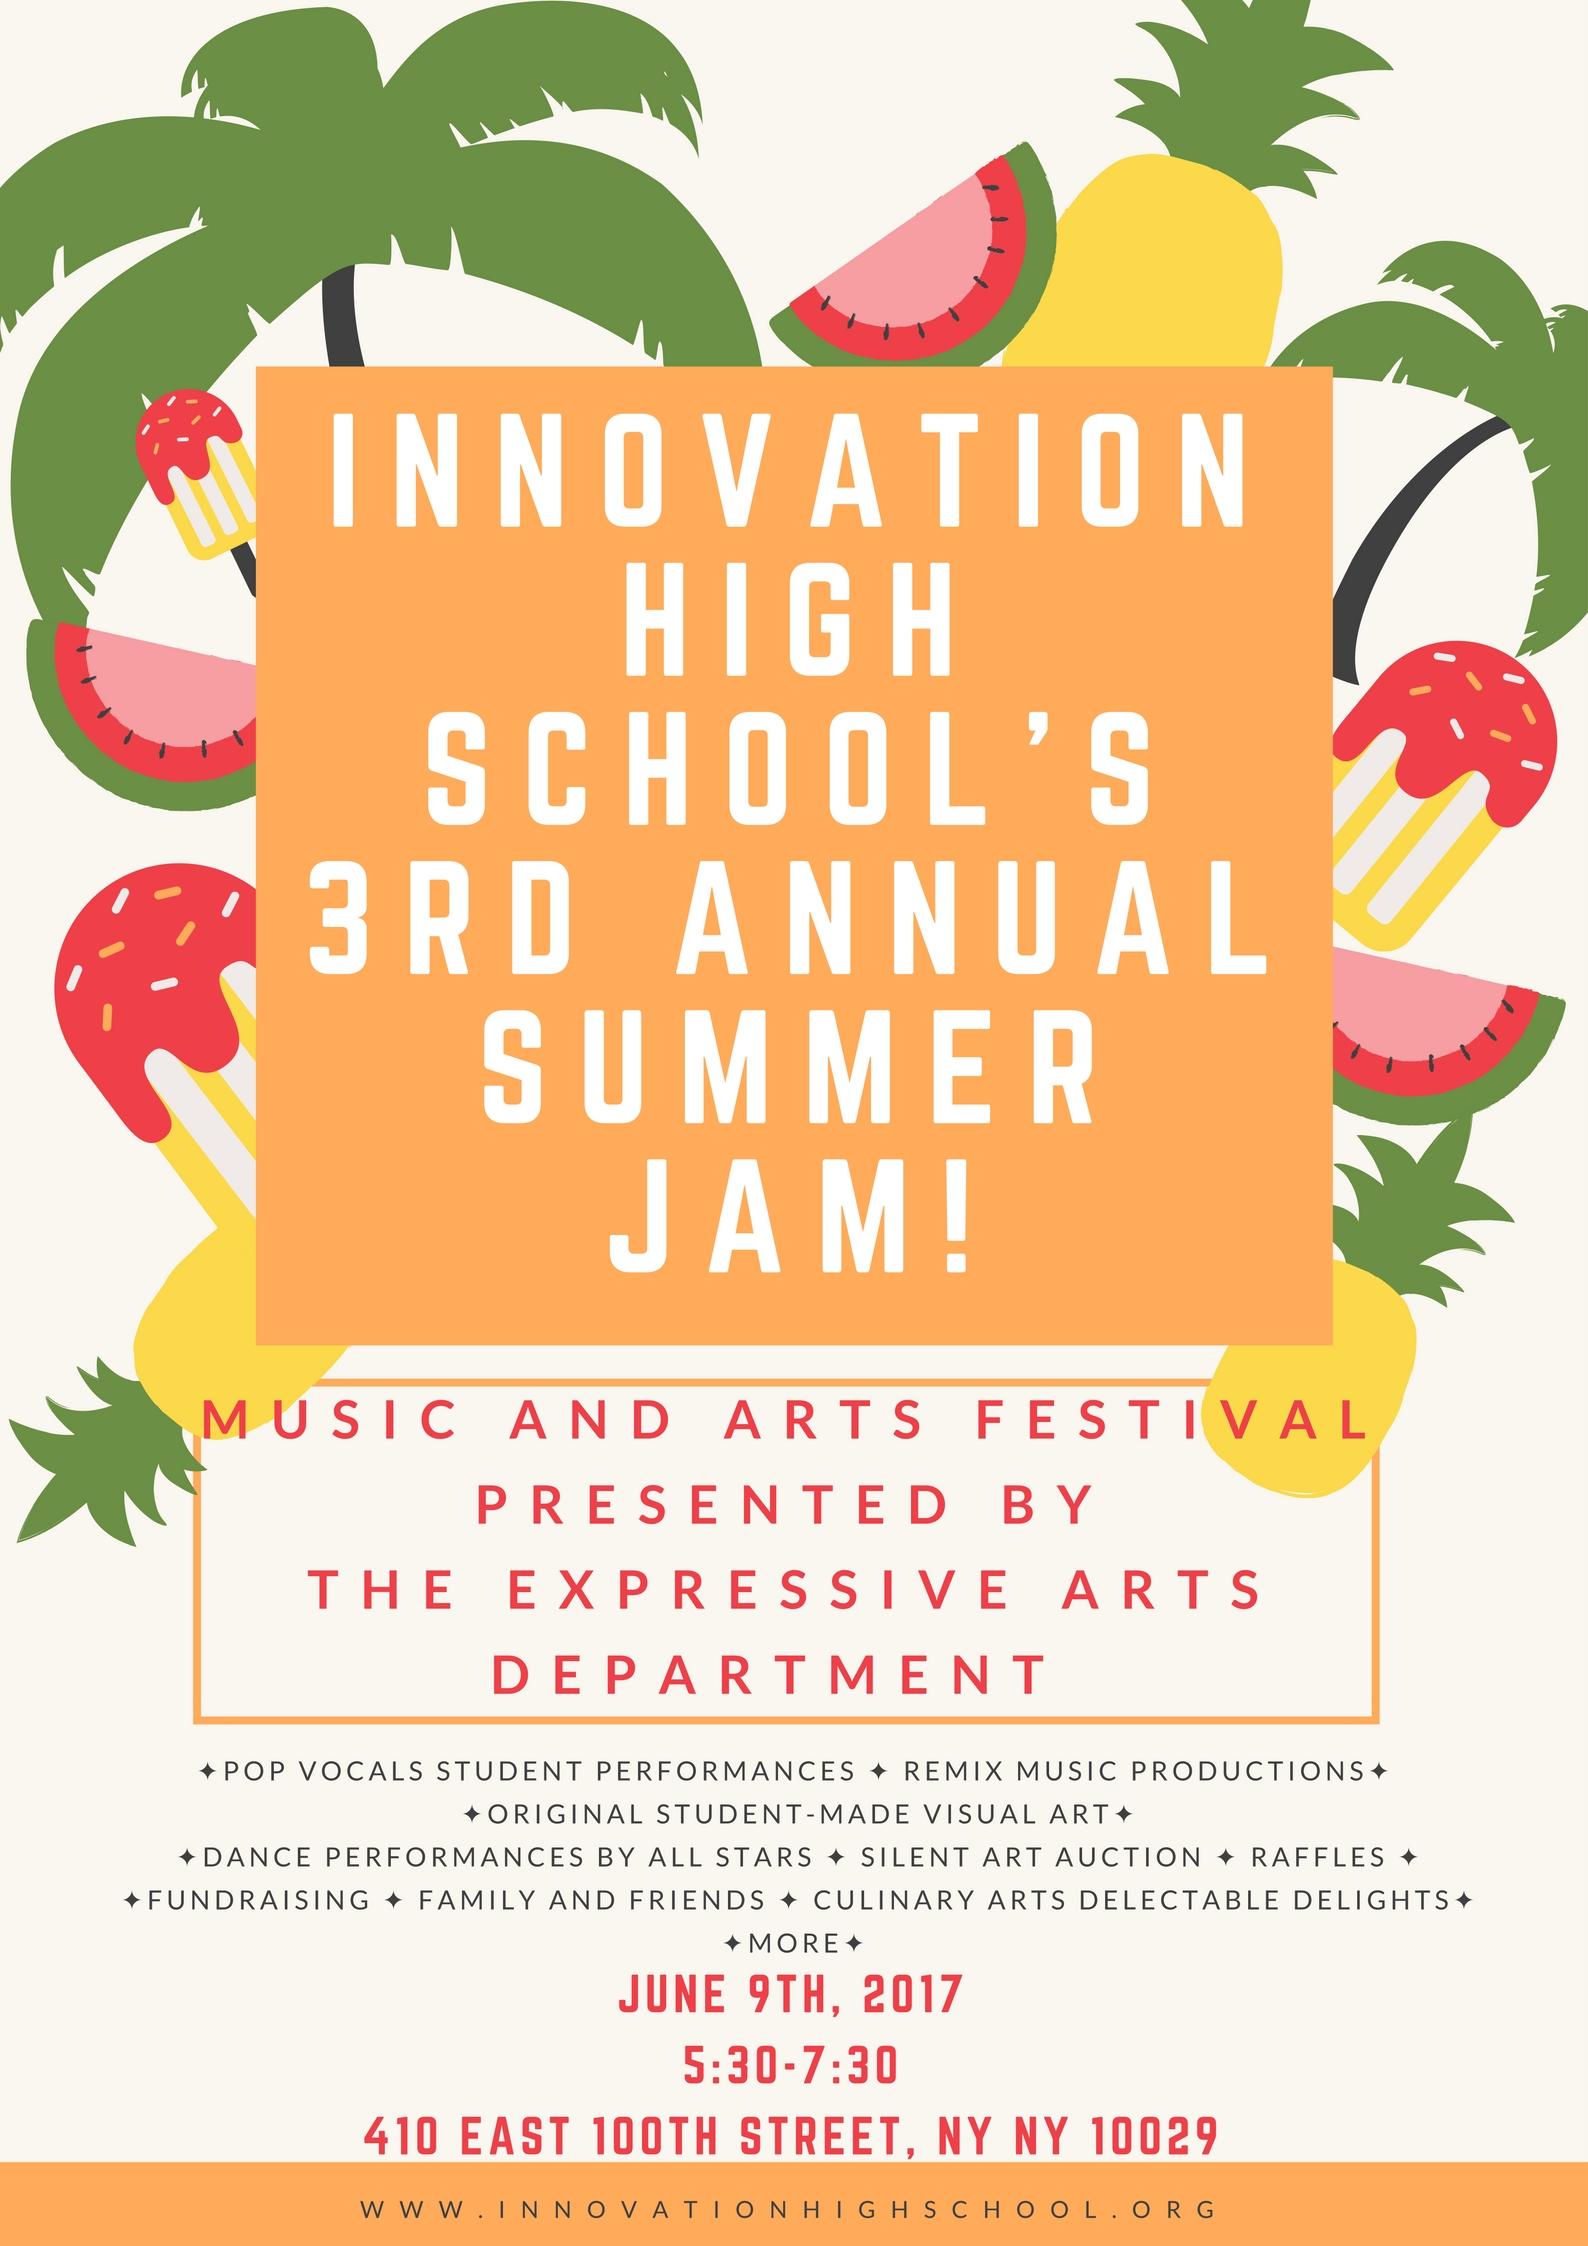 SUMMER JAM: 3rd Annual Innovation Music & Arts Festival